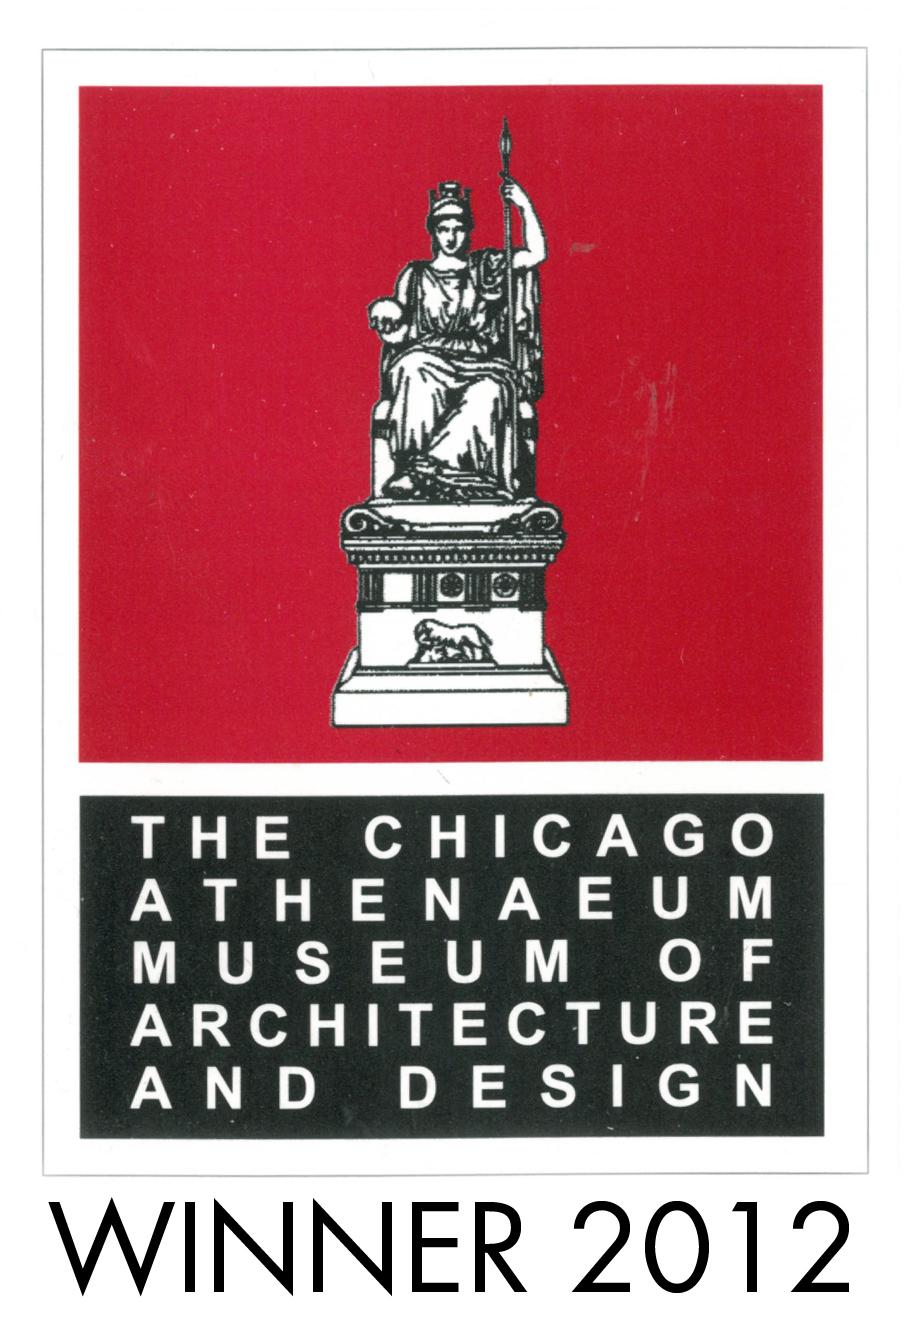 THe Chicago Athenaeum Museam Logowinner.jpg